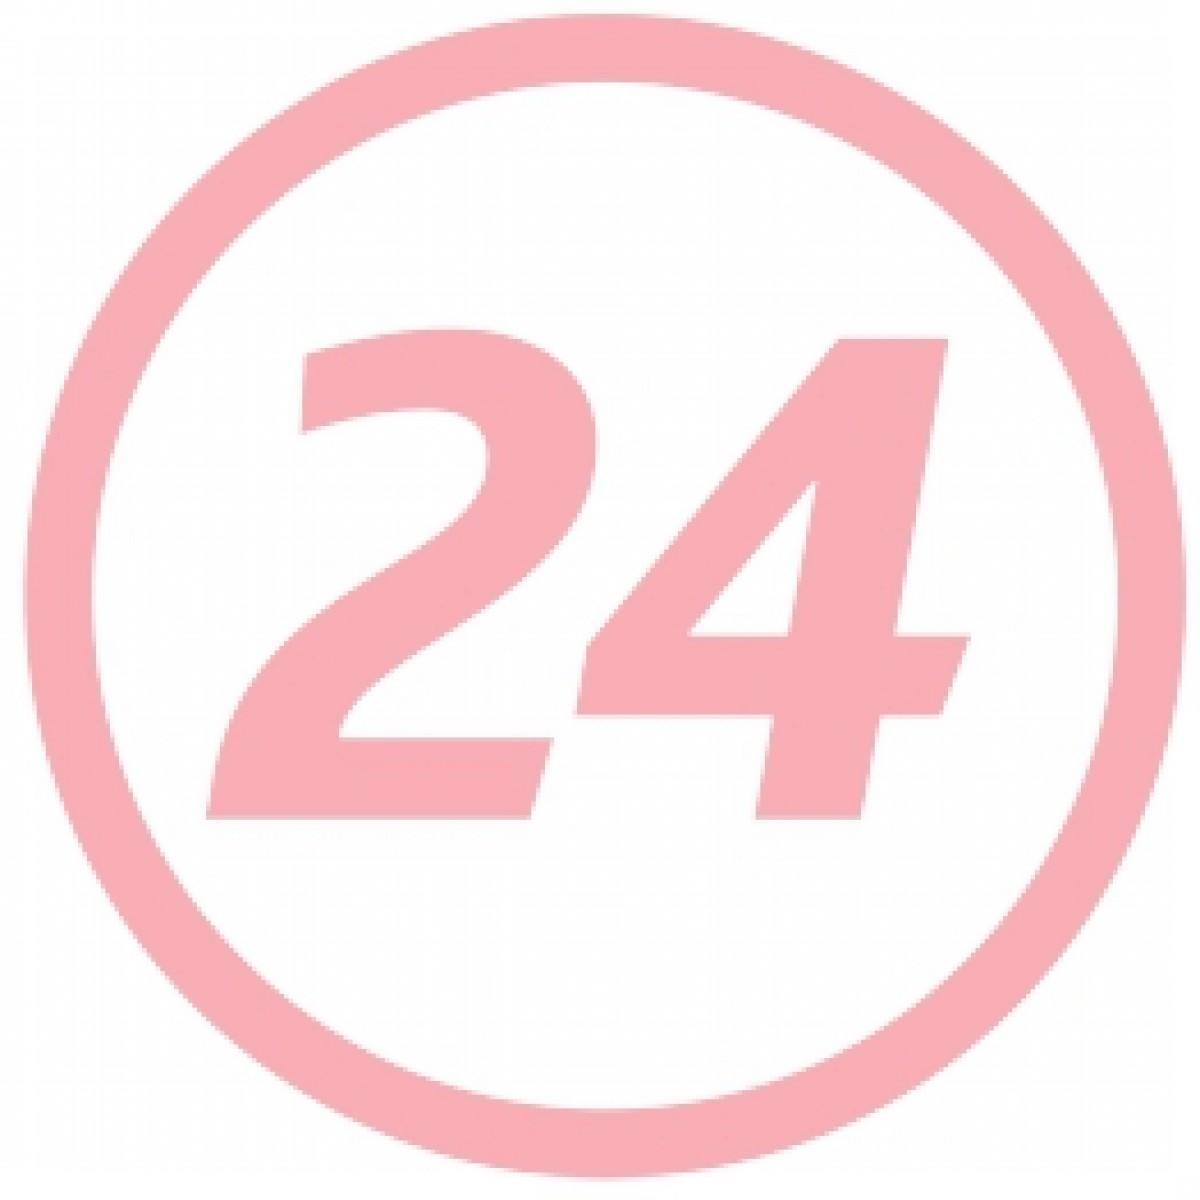 HARTMANN Mediset Spatule Linguale din Plastic Sterile Ambalate Individual, Spatule, 50buc